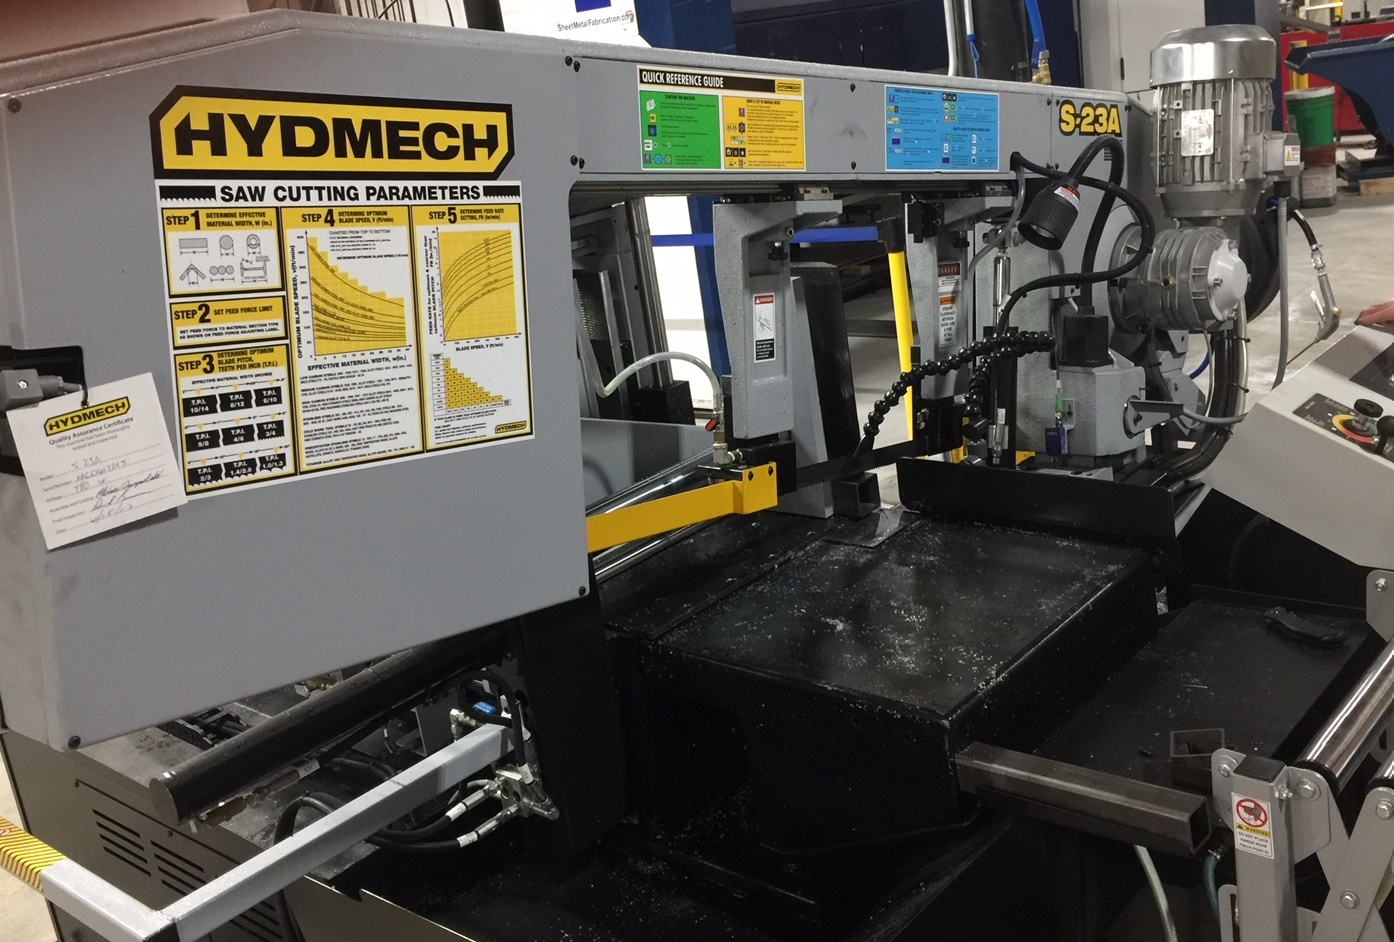 Marlin Steel Adds a Hydmech S-23A Automatic Pivot Style Band Saw